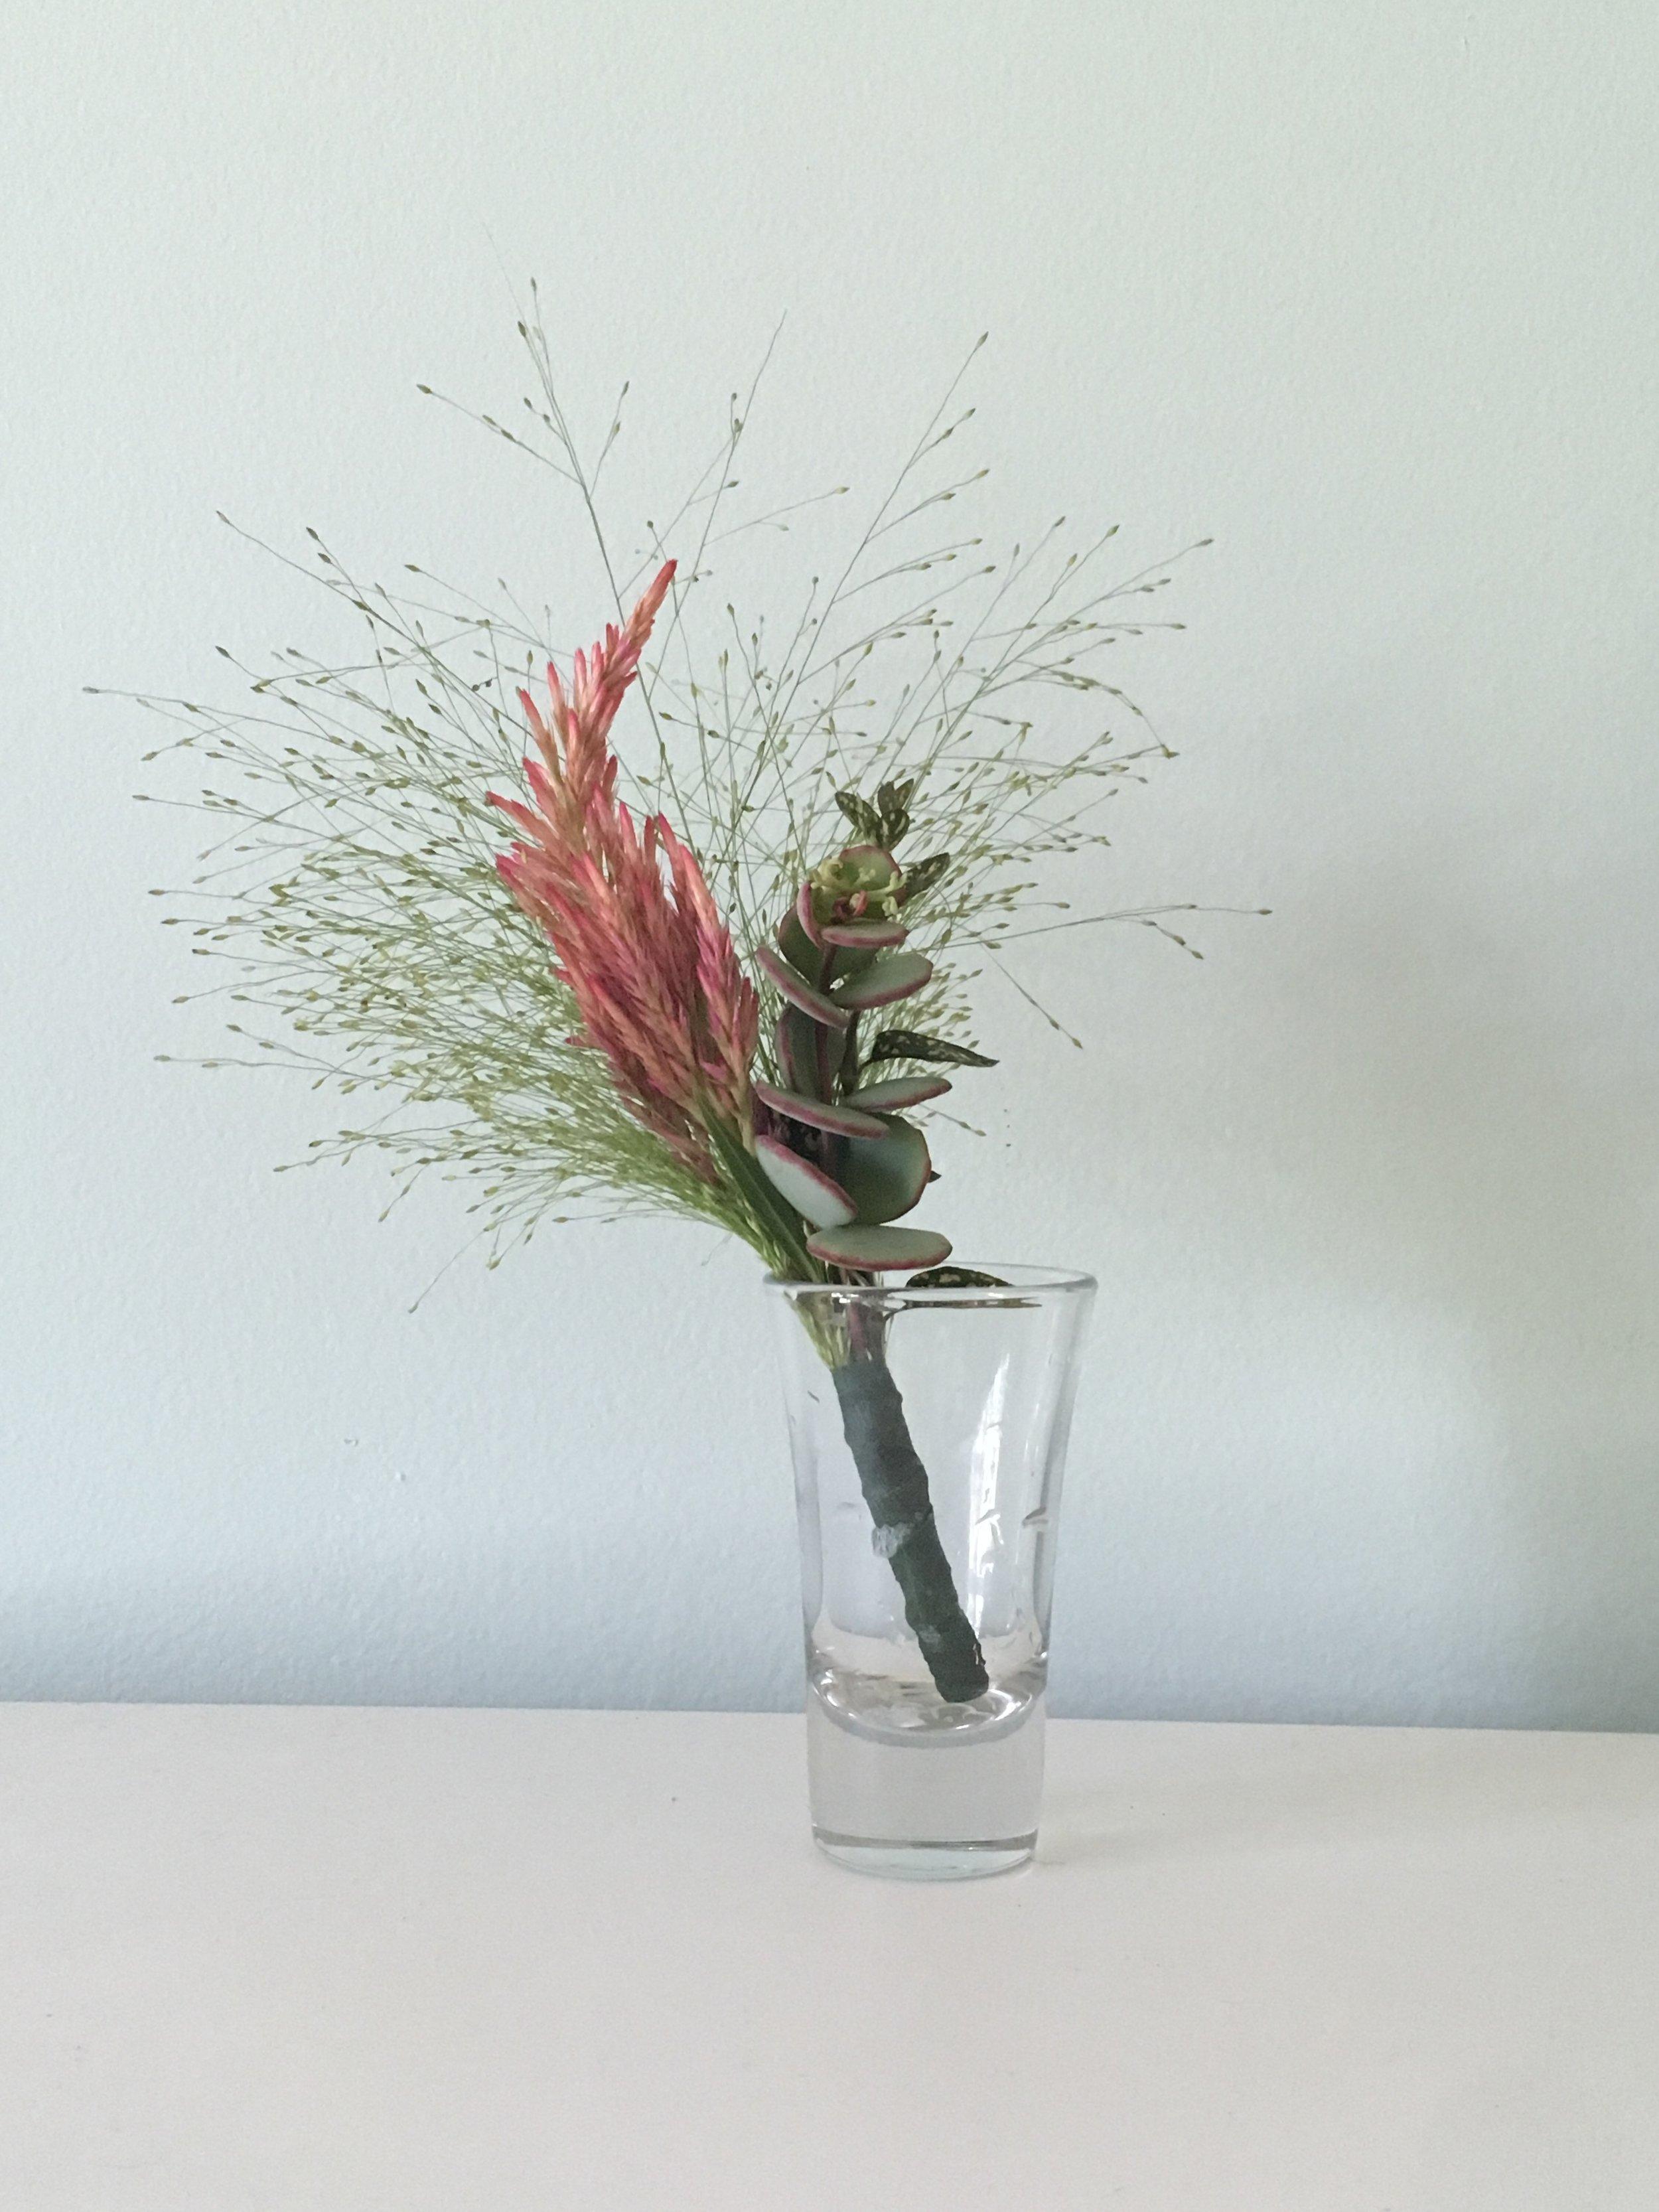 Ornamental Grass, Jade Leaf, Paintbrush